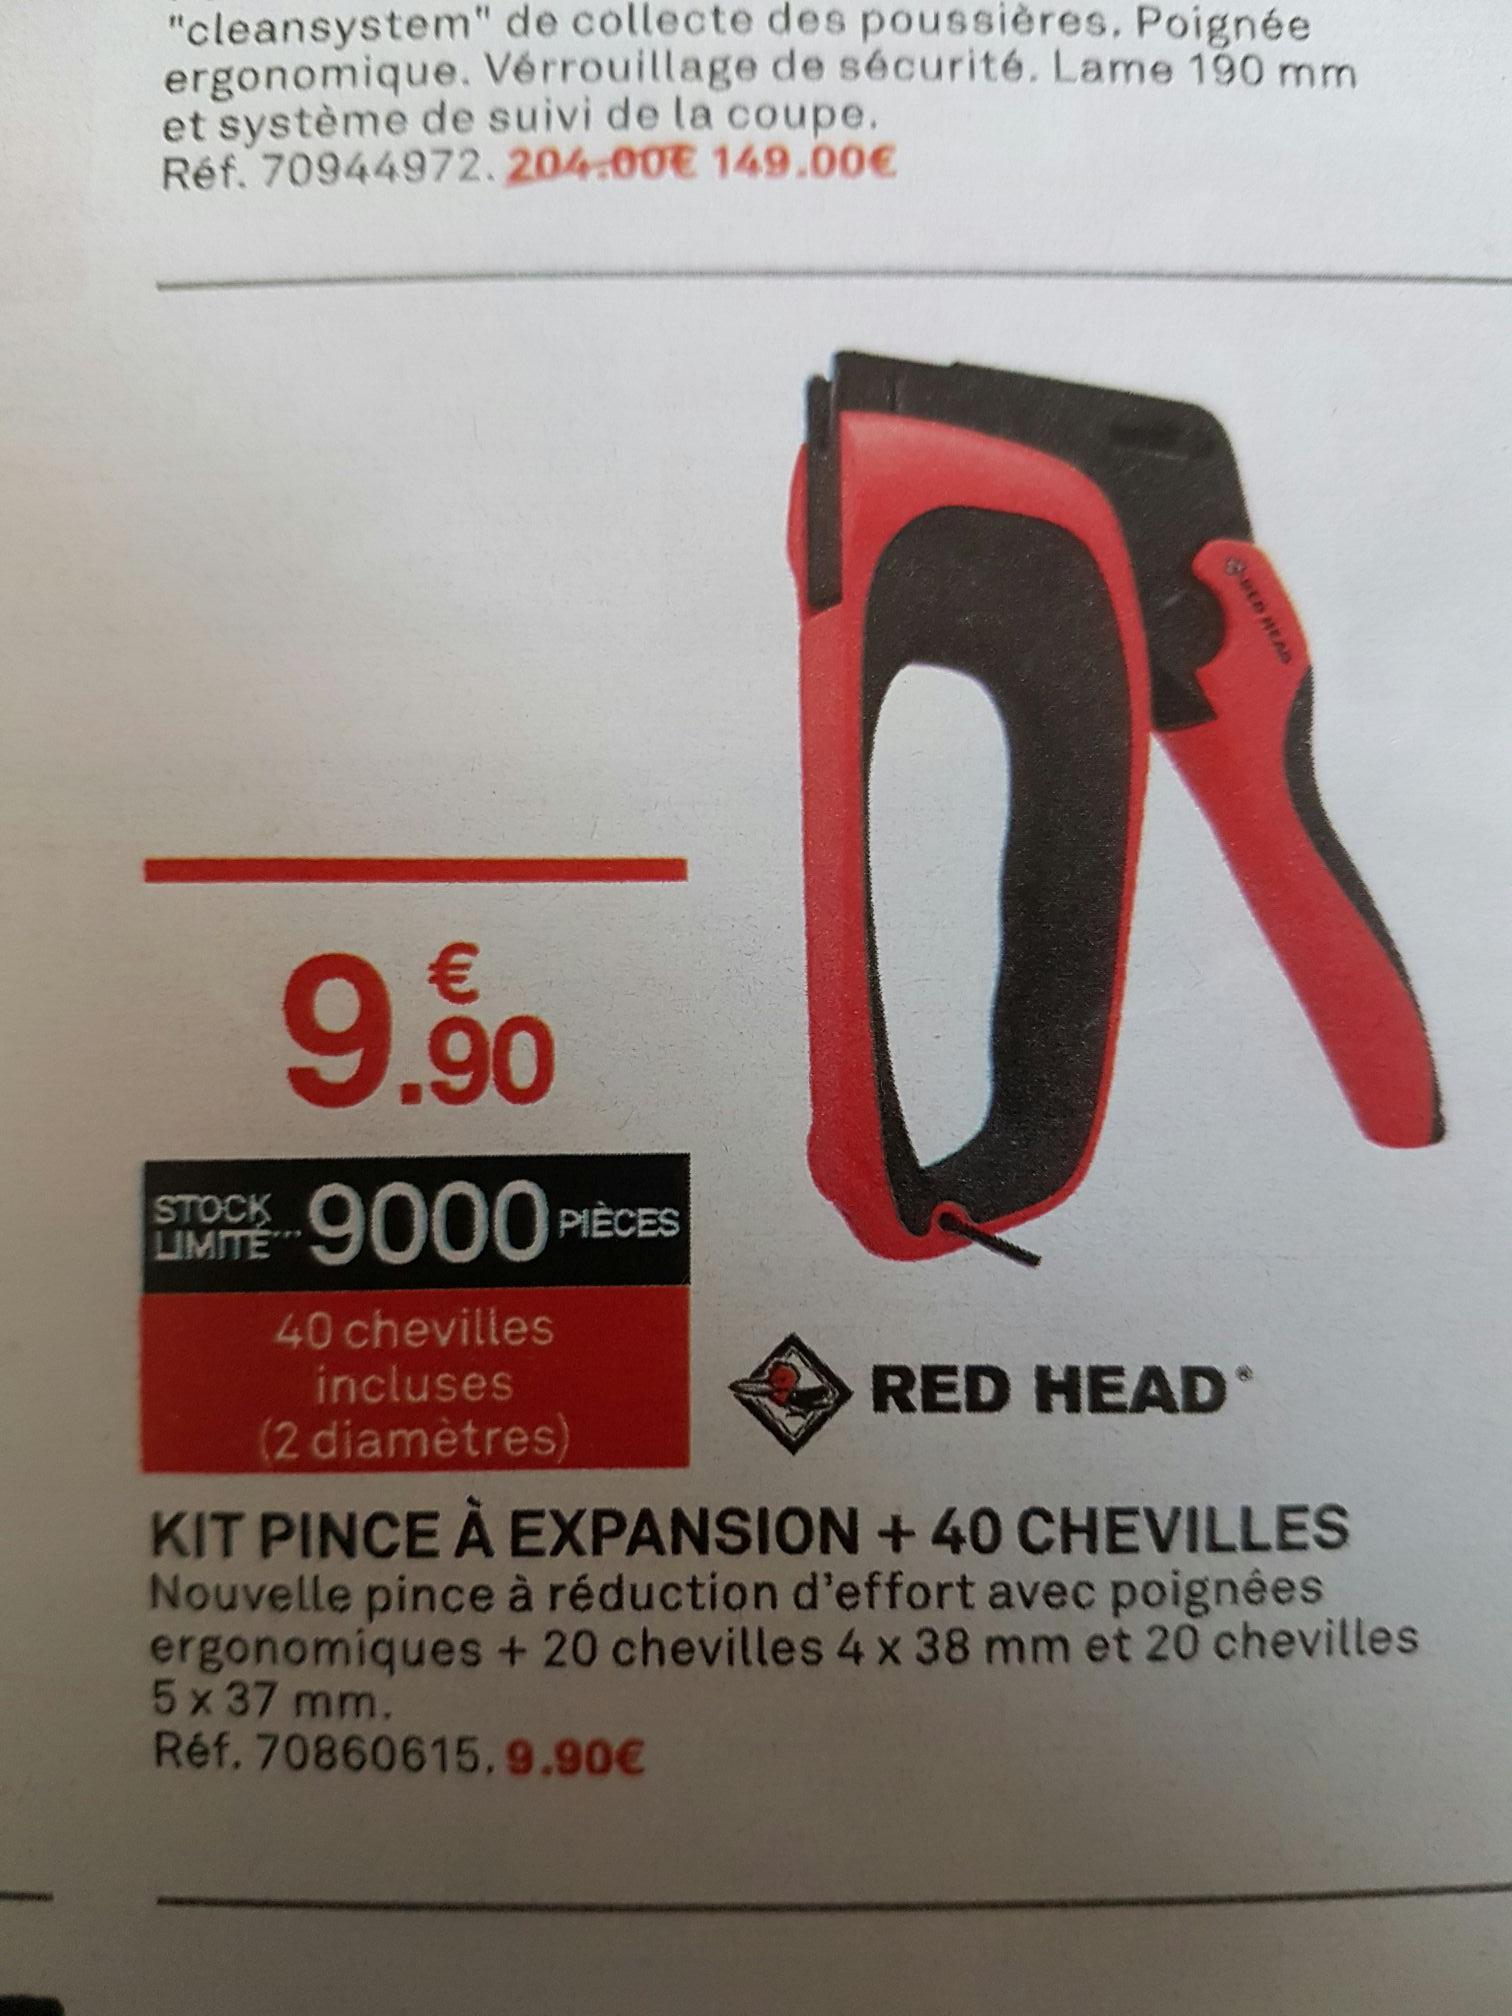 Pince à expansion Red Head + 40 chevilles